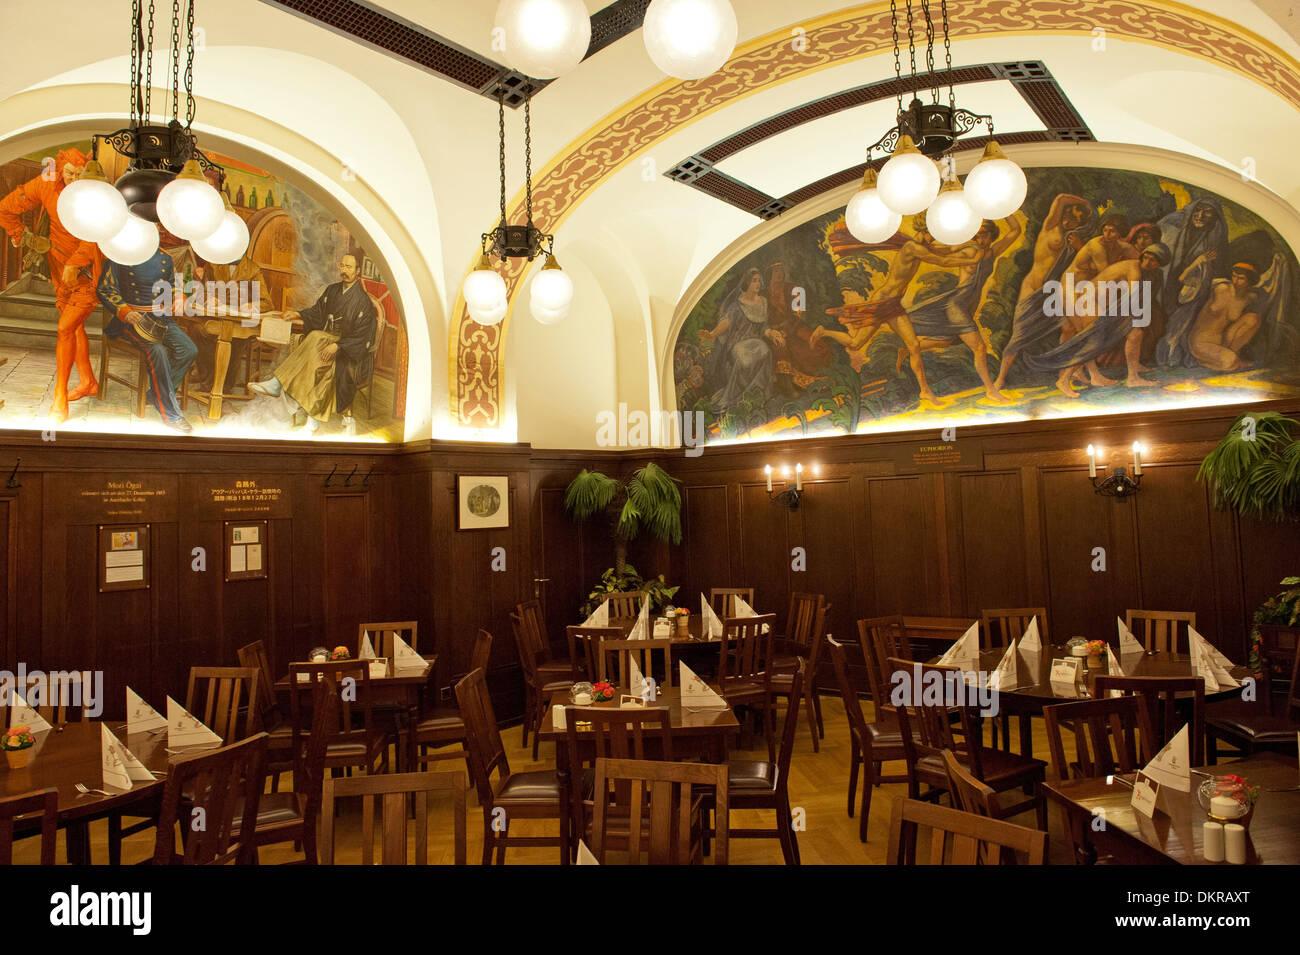 Leipzig Restaurant Auerbachs Keller Old Town History Culture Stock Photo Alamy